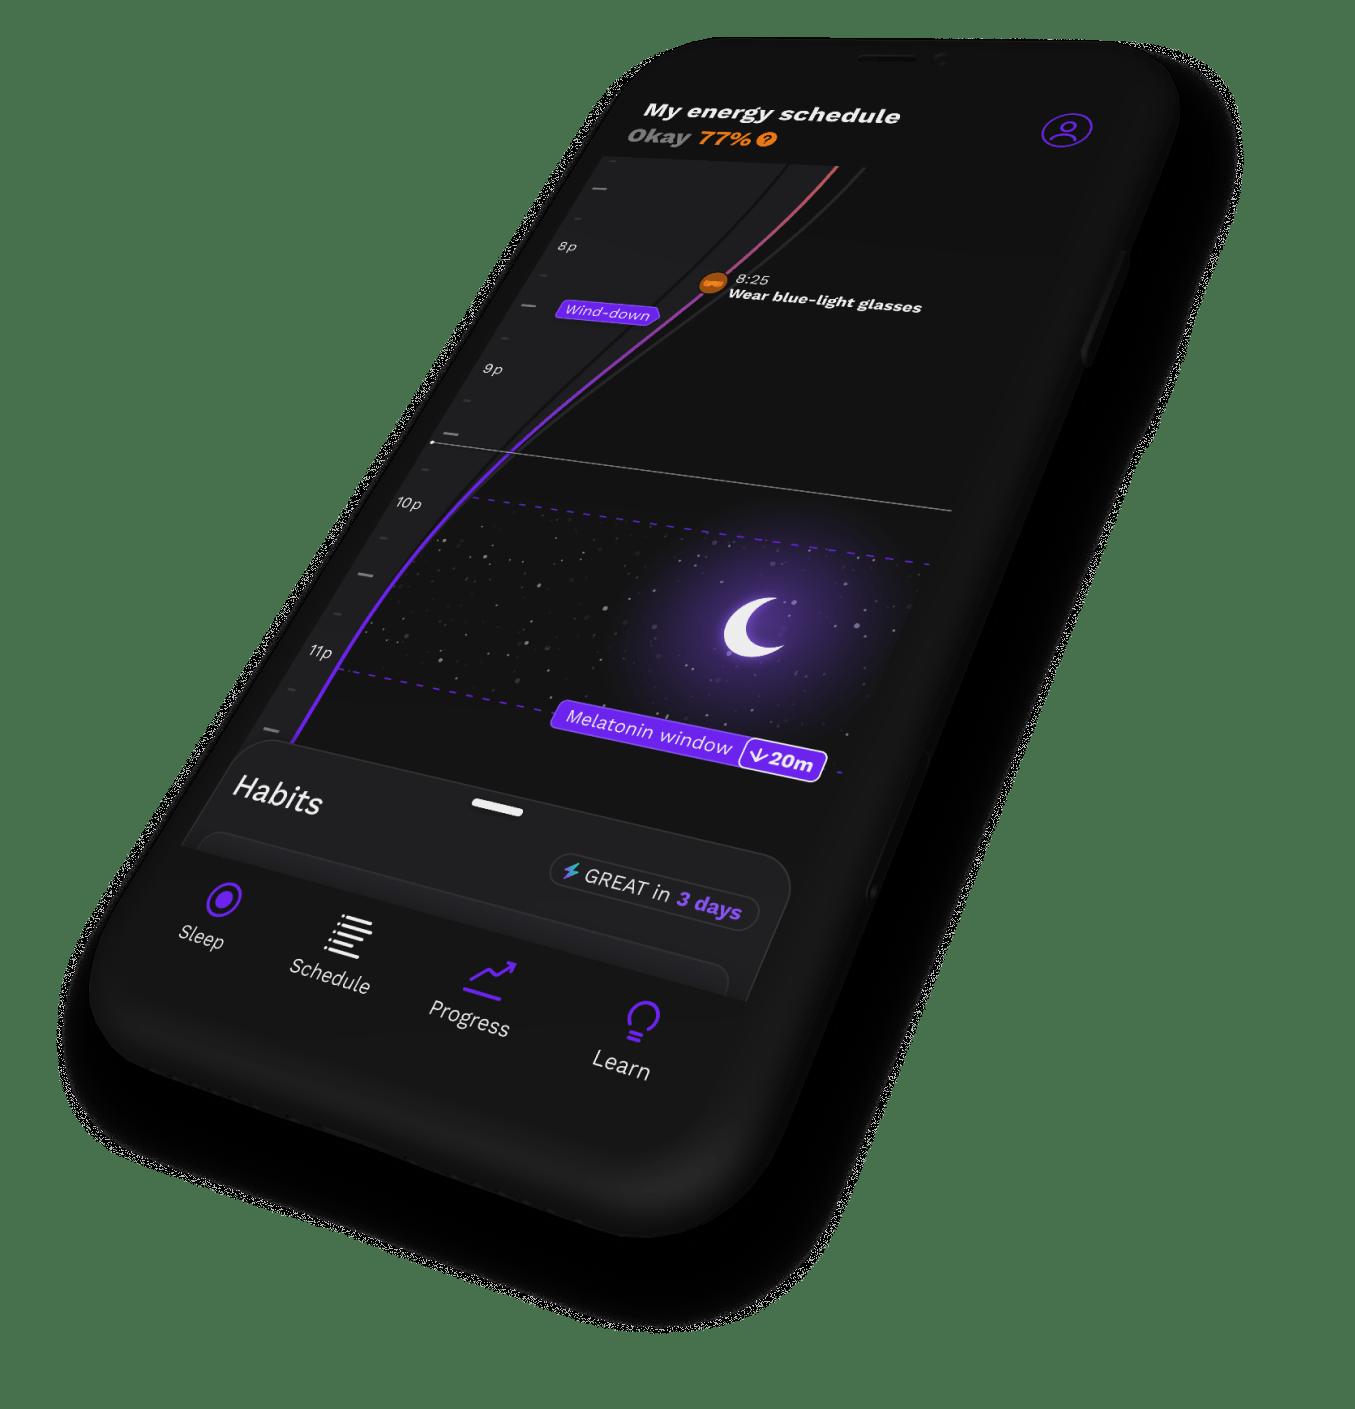 Product Screenshot on phone